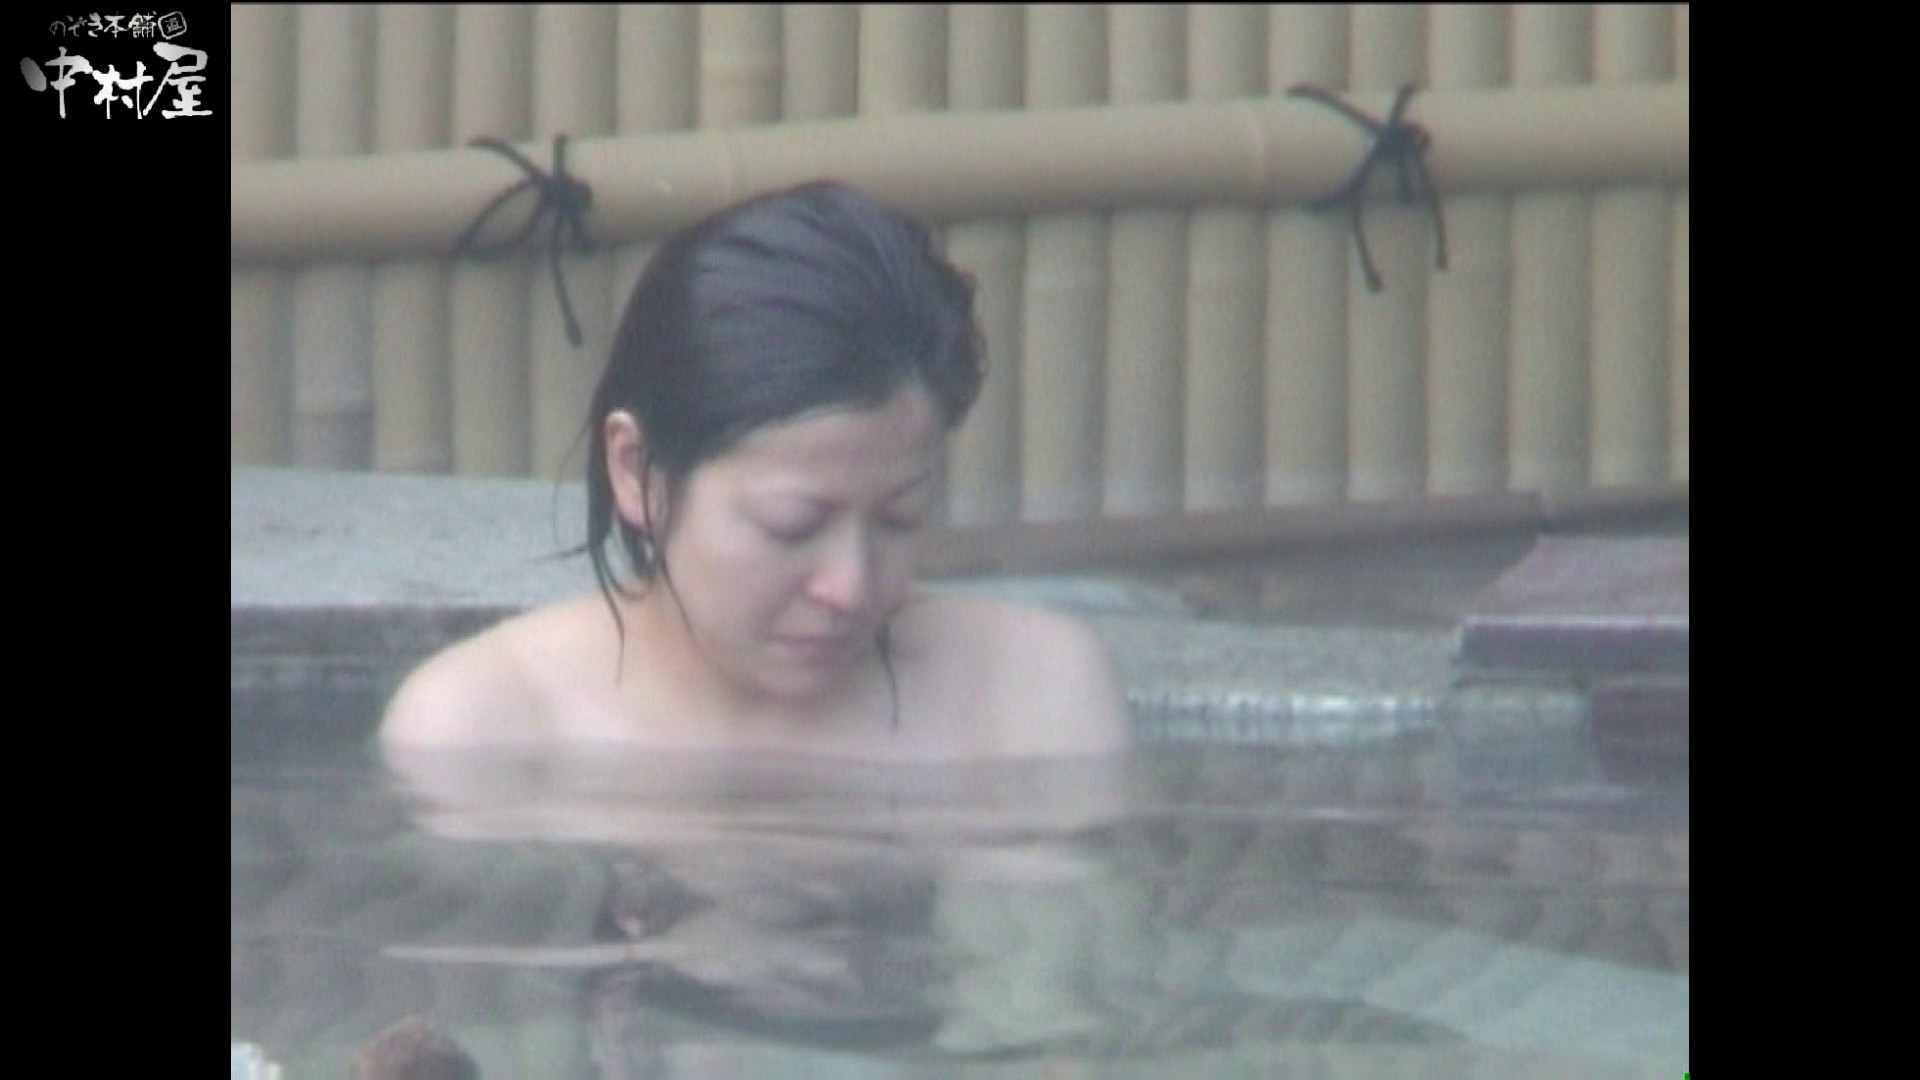 Aquaな露天風呂Vol.986 盗撮  94連発 37